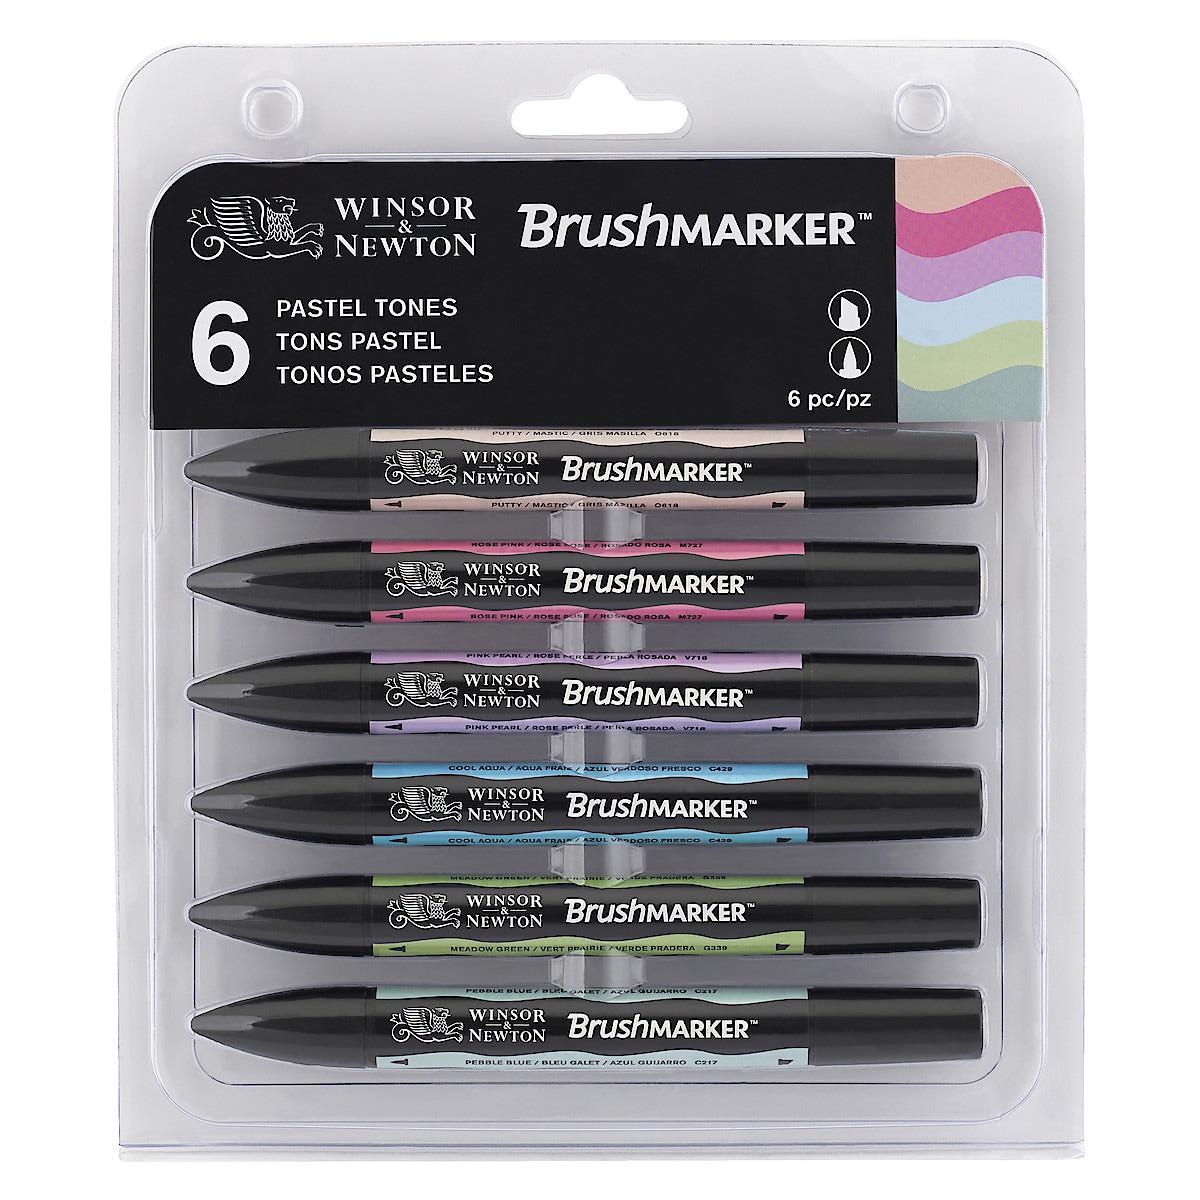 Filzstift Winsor & Newton BrushMarker Pastell 6er-Pack